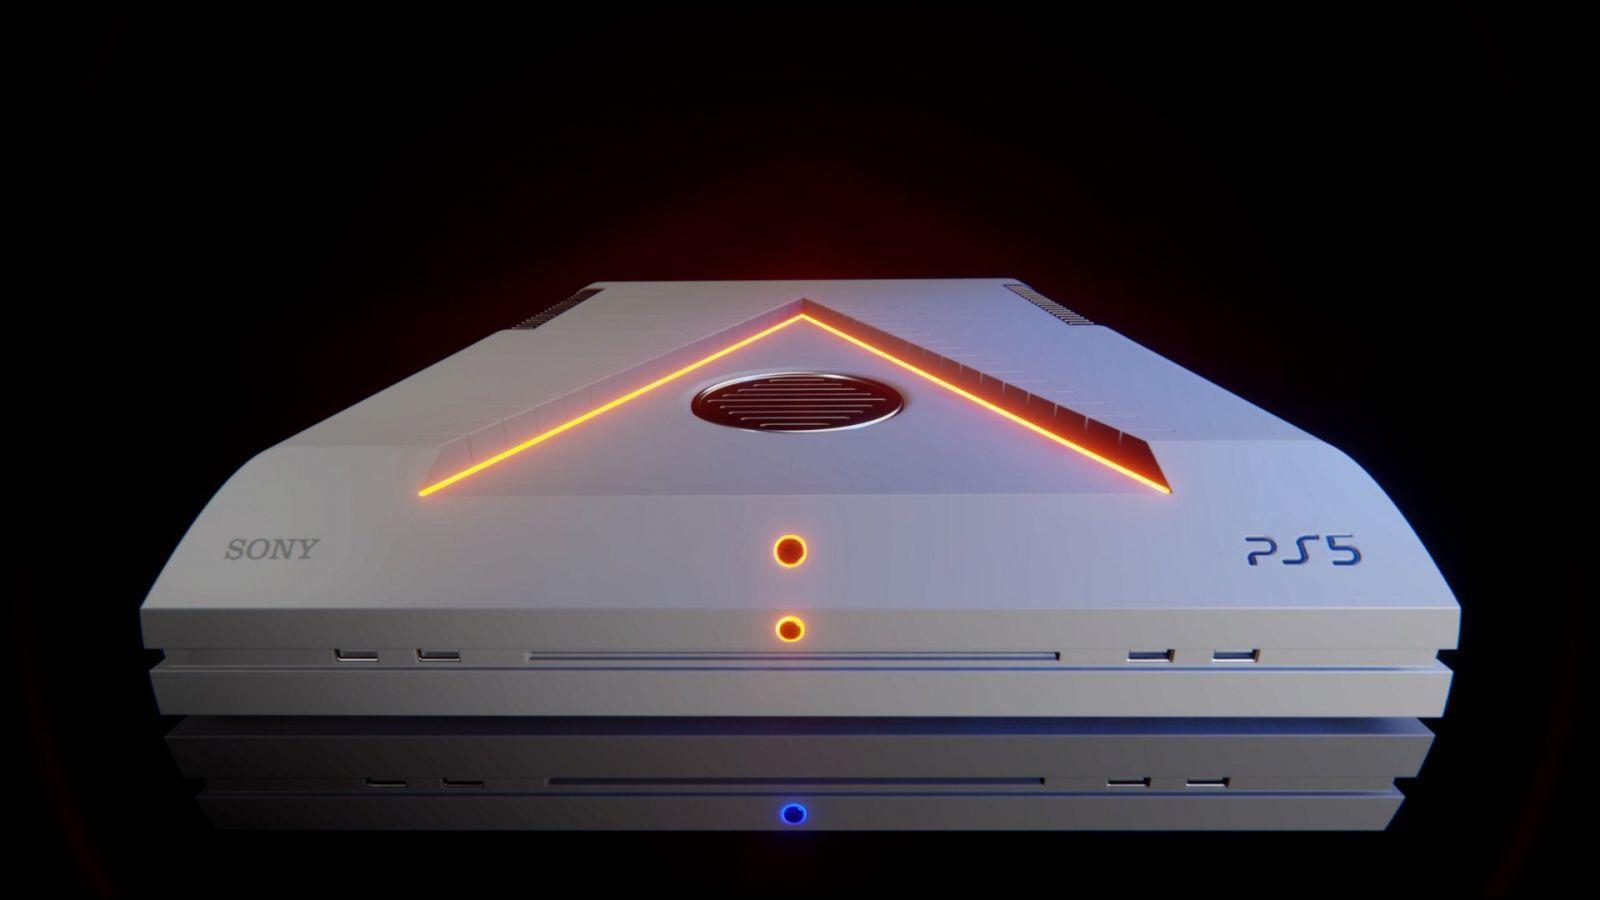 Пандемия коронавируса не повлияла на выход приставки PlayStation 5 (400882 fpoawrzivf ps5 concept 6 1578938374930)